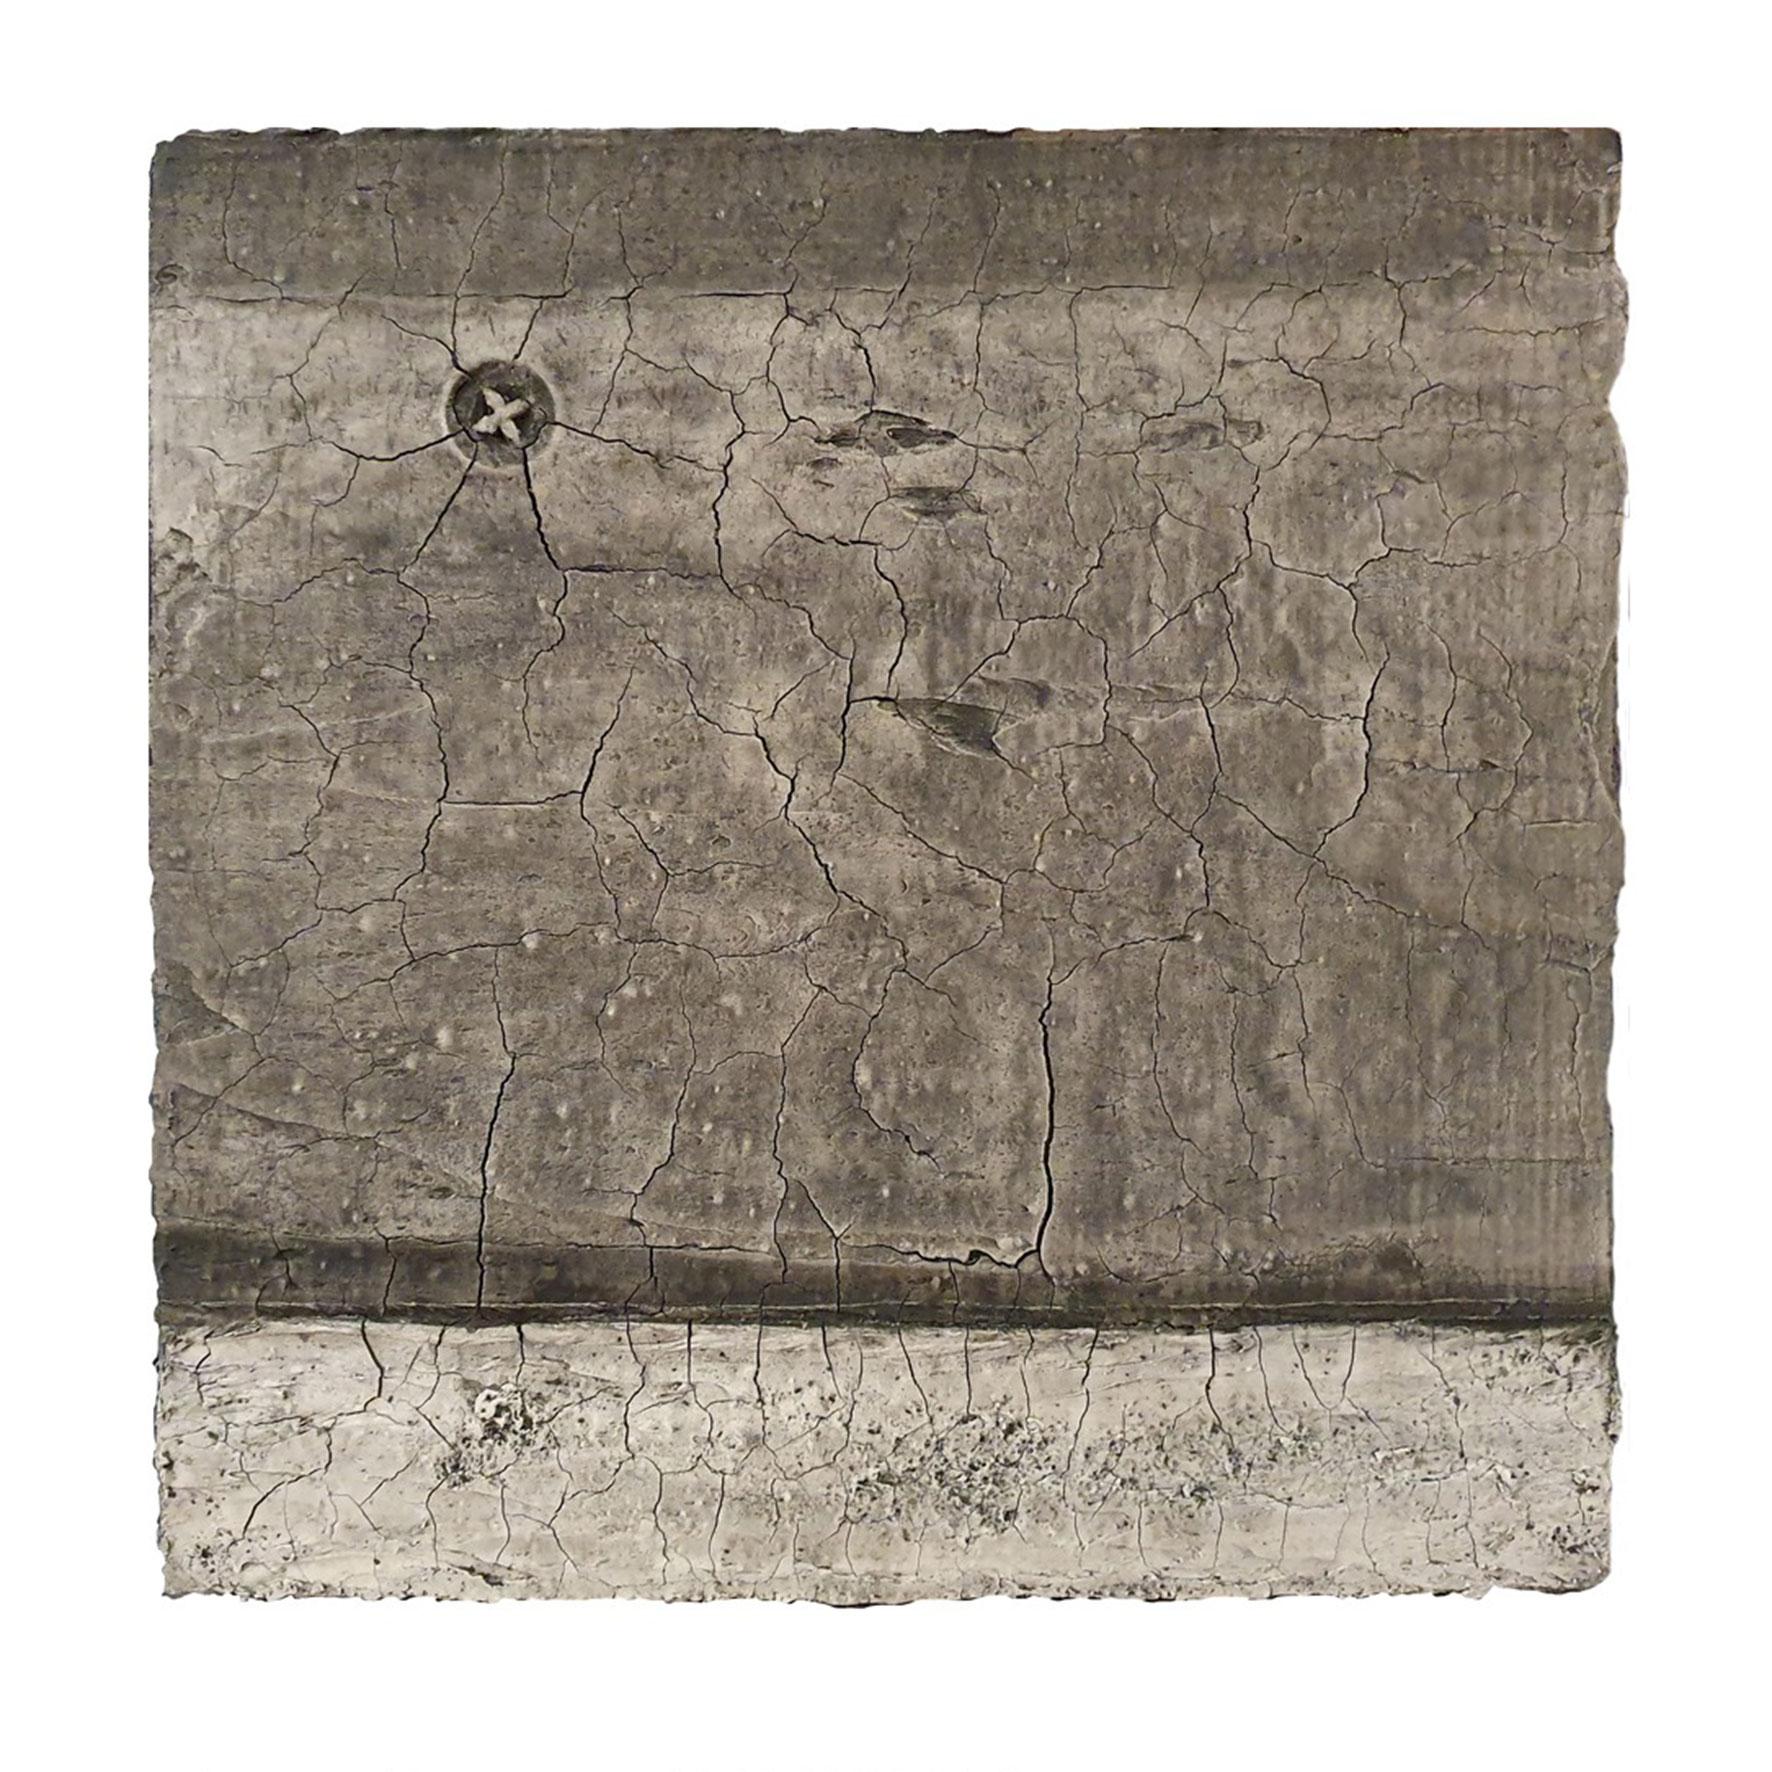 Jean-Peter-Rieken-Untitled3-25x25